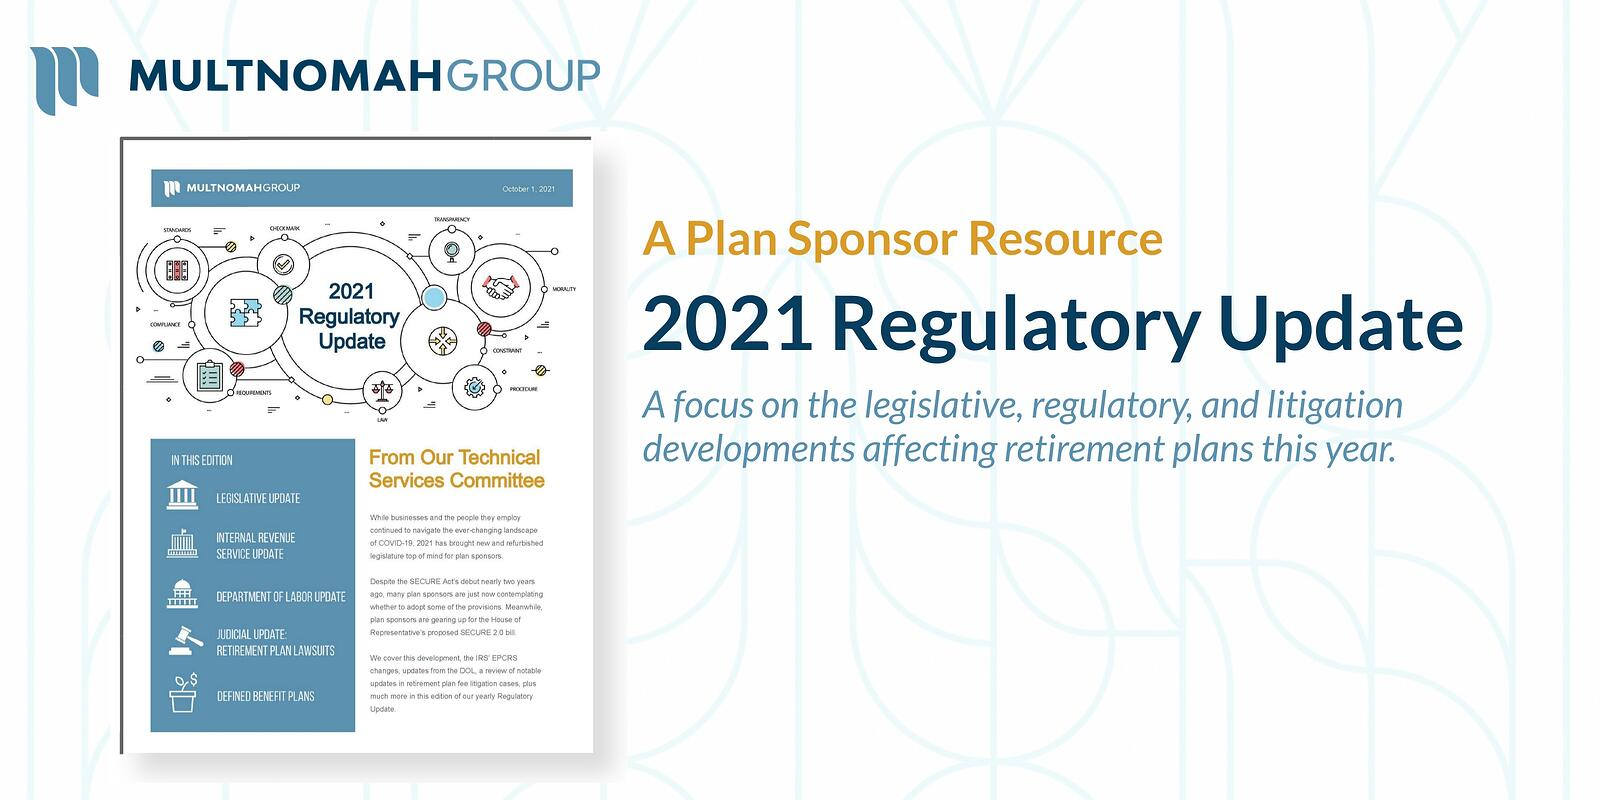 2021 Regulatory Update